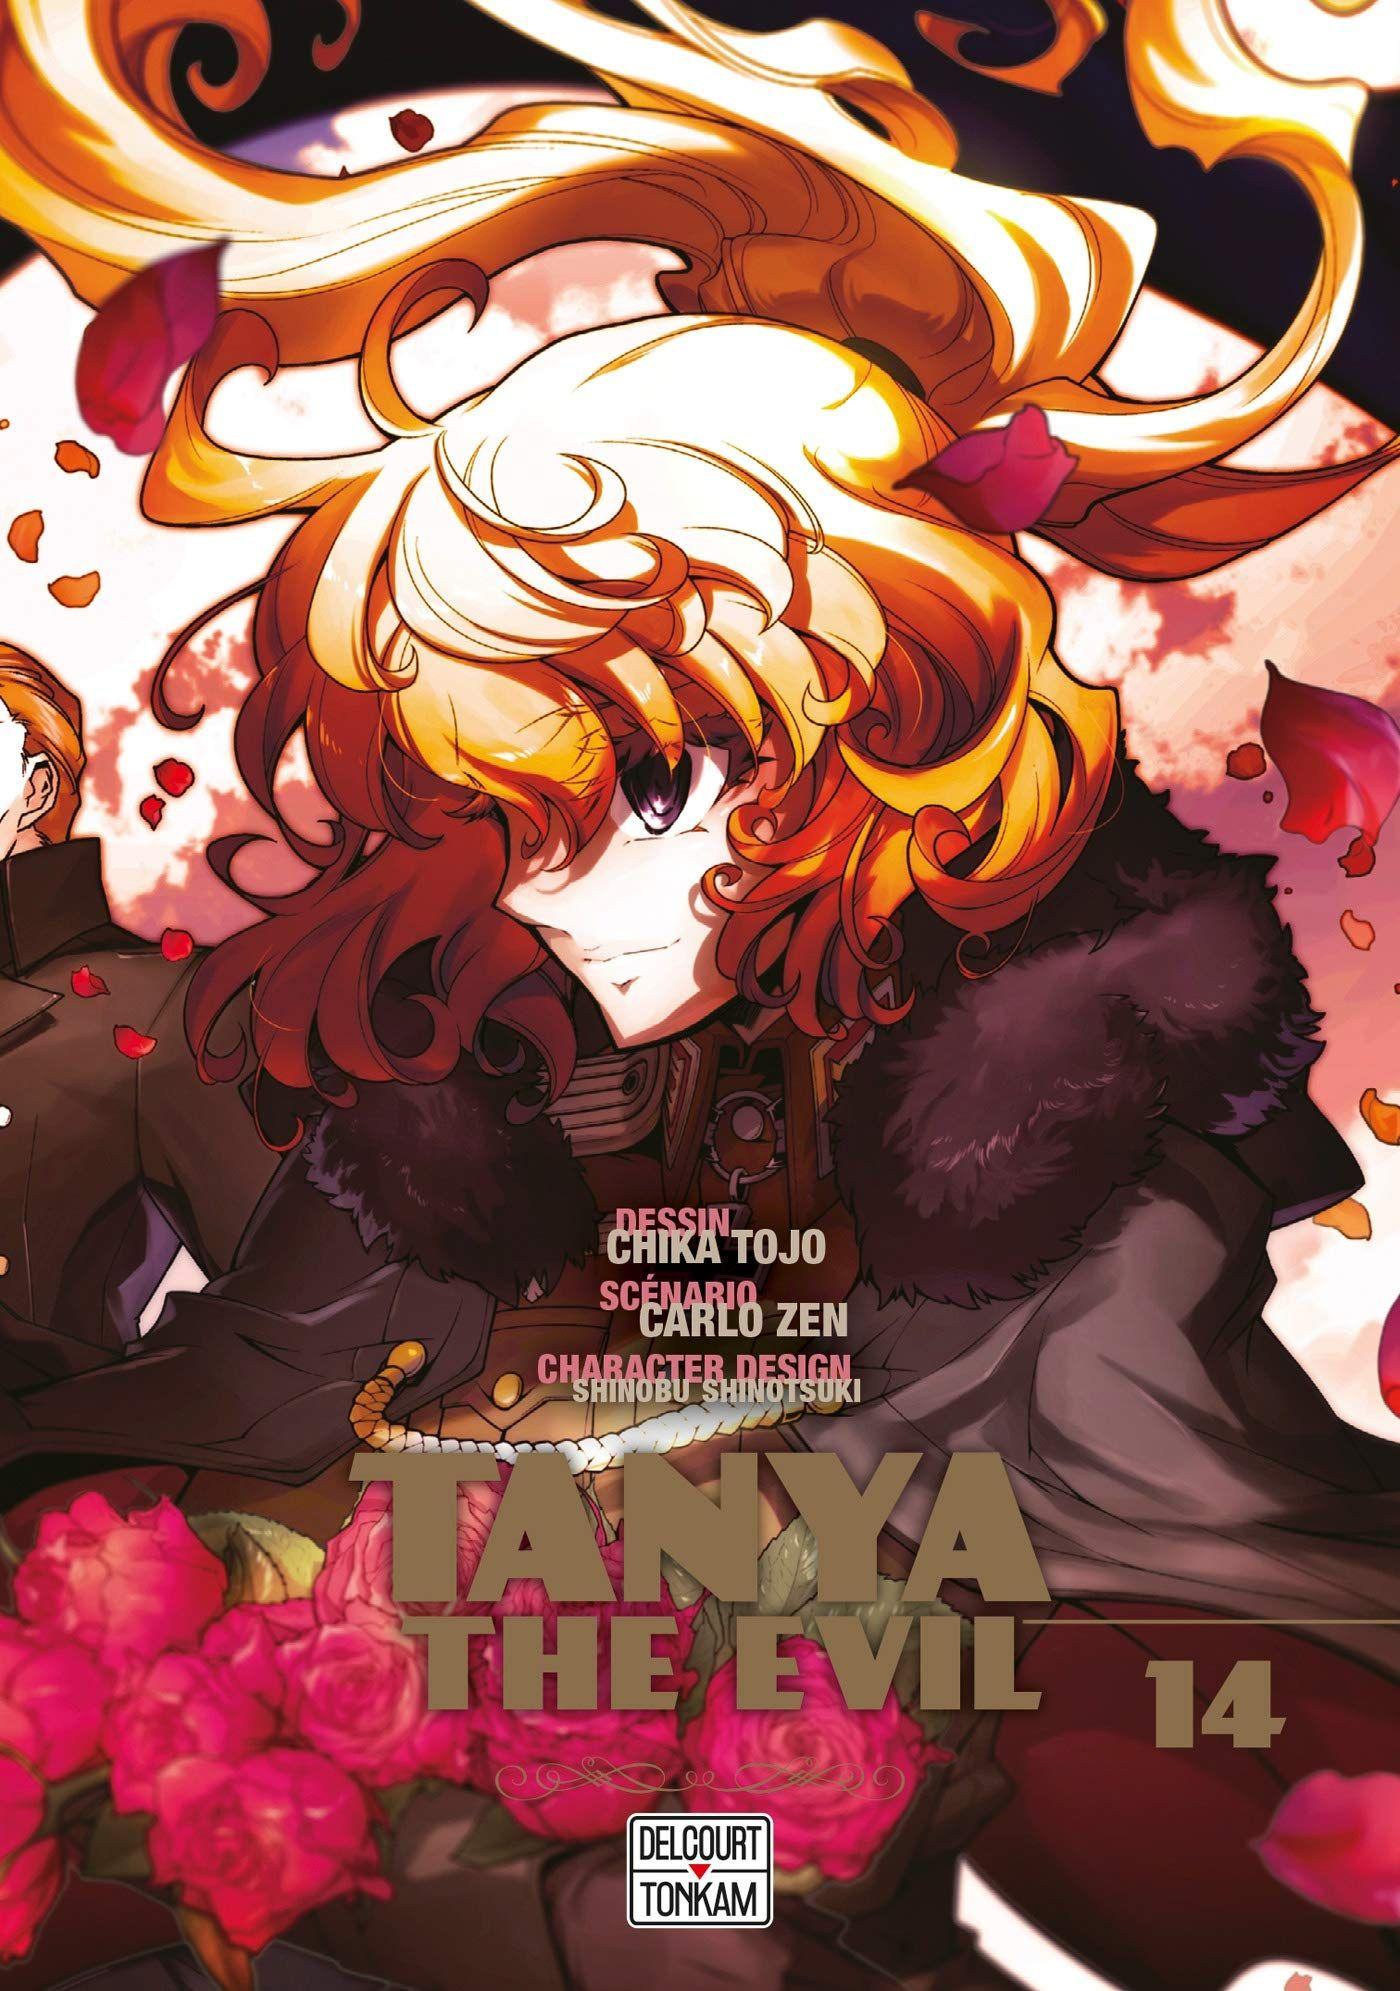 Sortie Manga au Québec JUIN 2021 Tanya-evil-14-delcourt